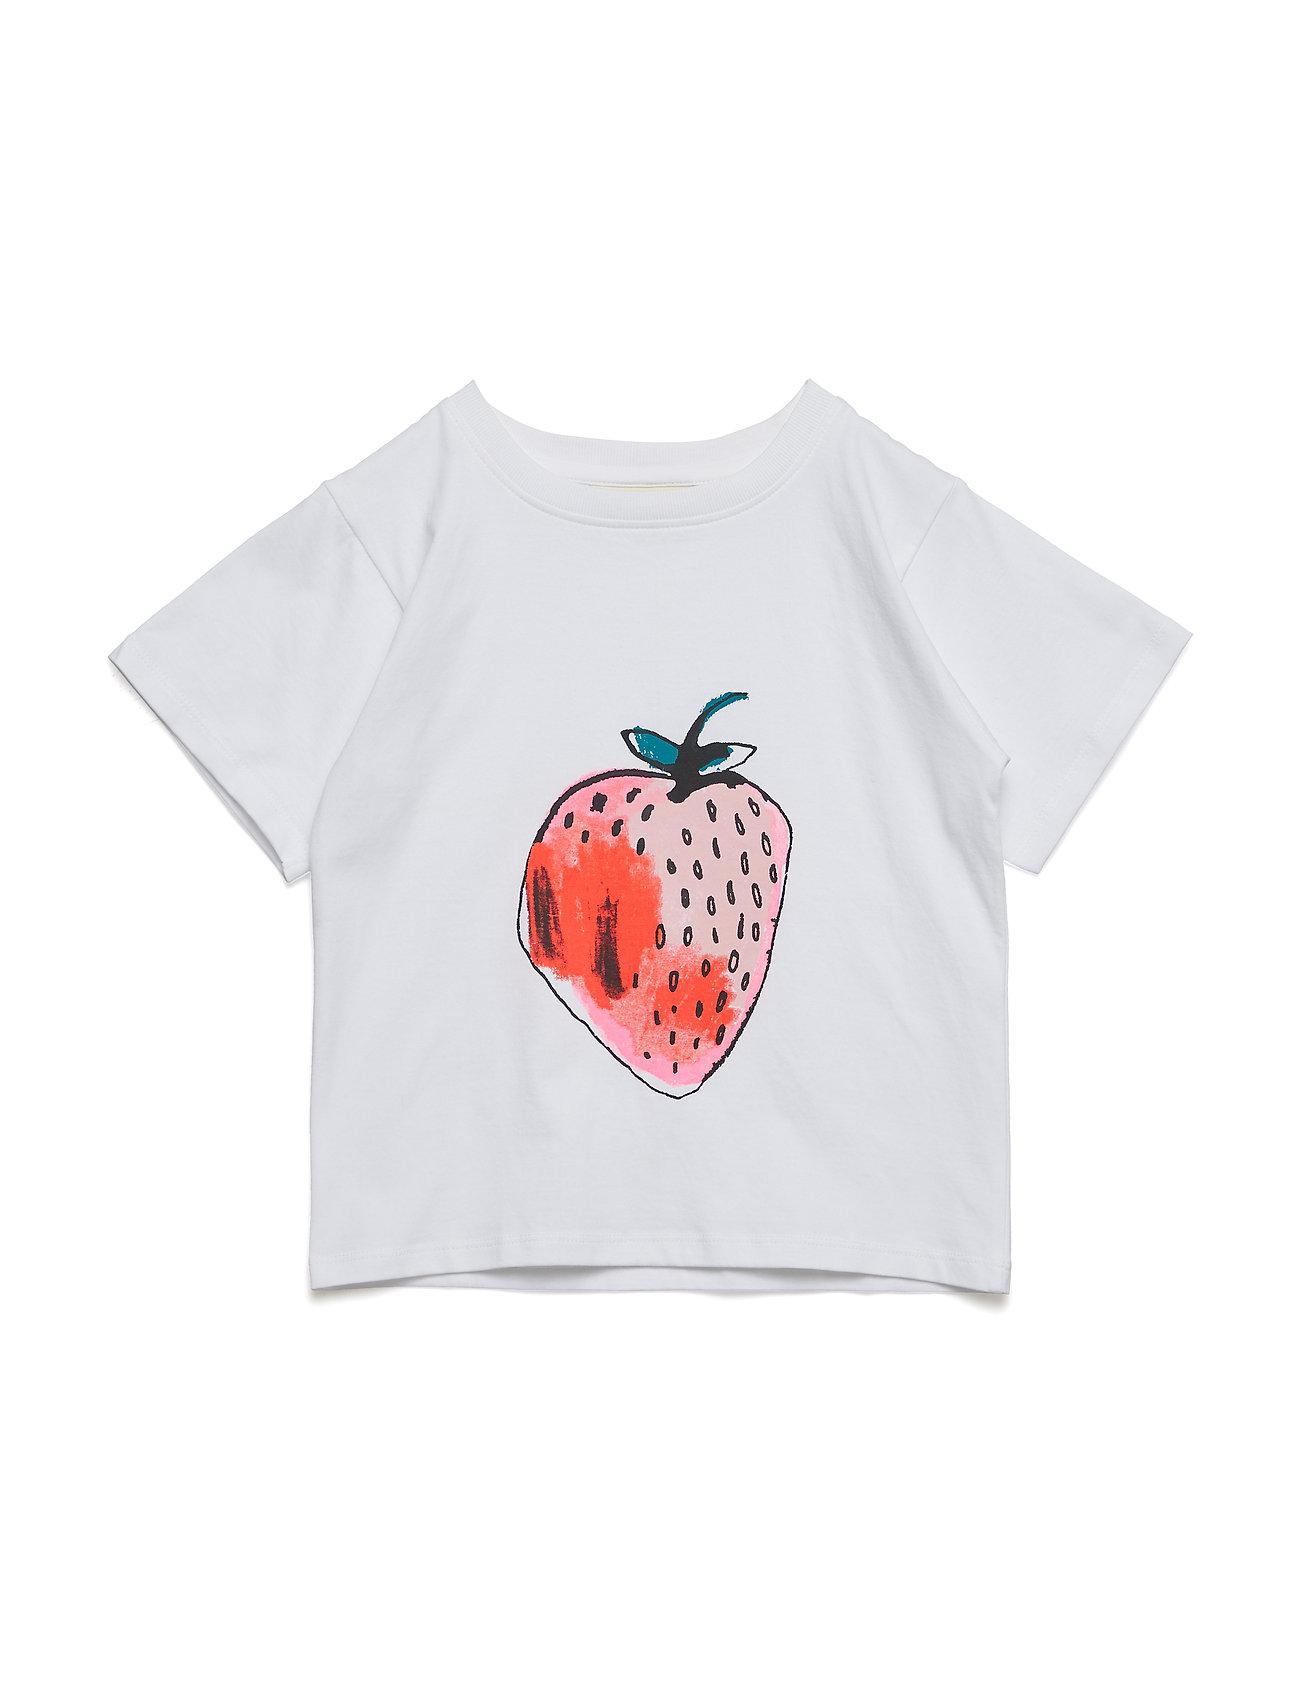 Soft Gallery Dominique T-shirt - WHITE, FRAISE